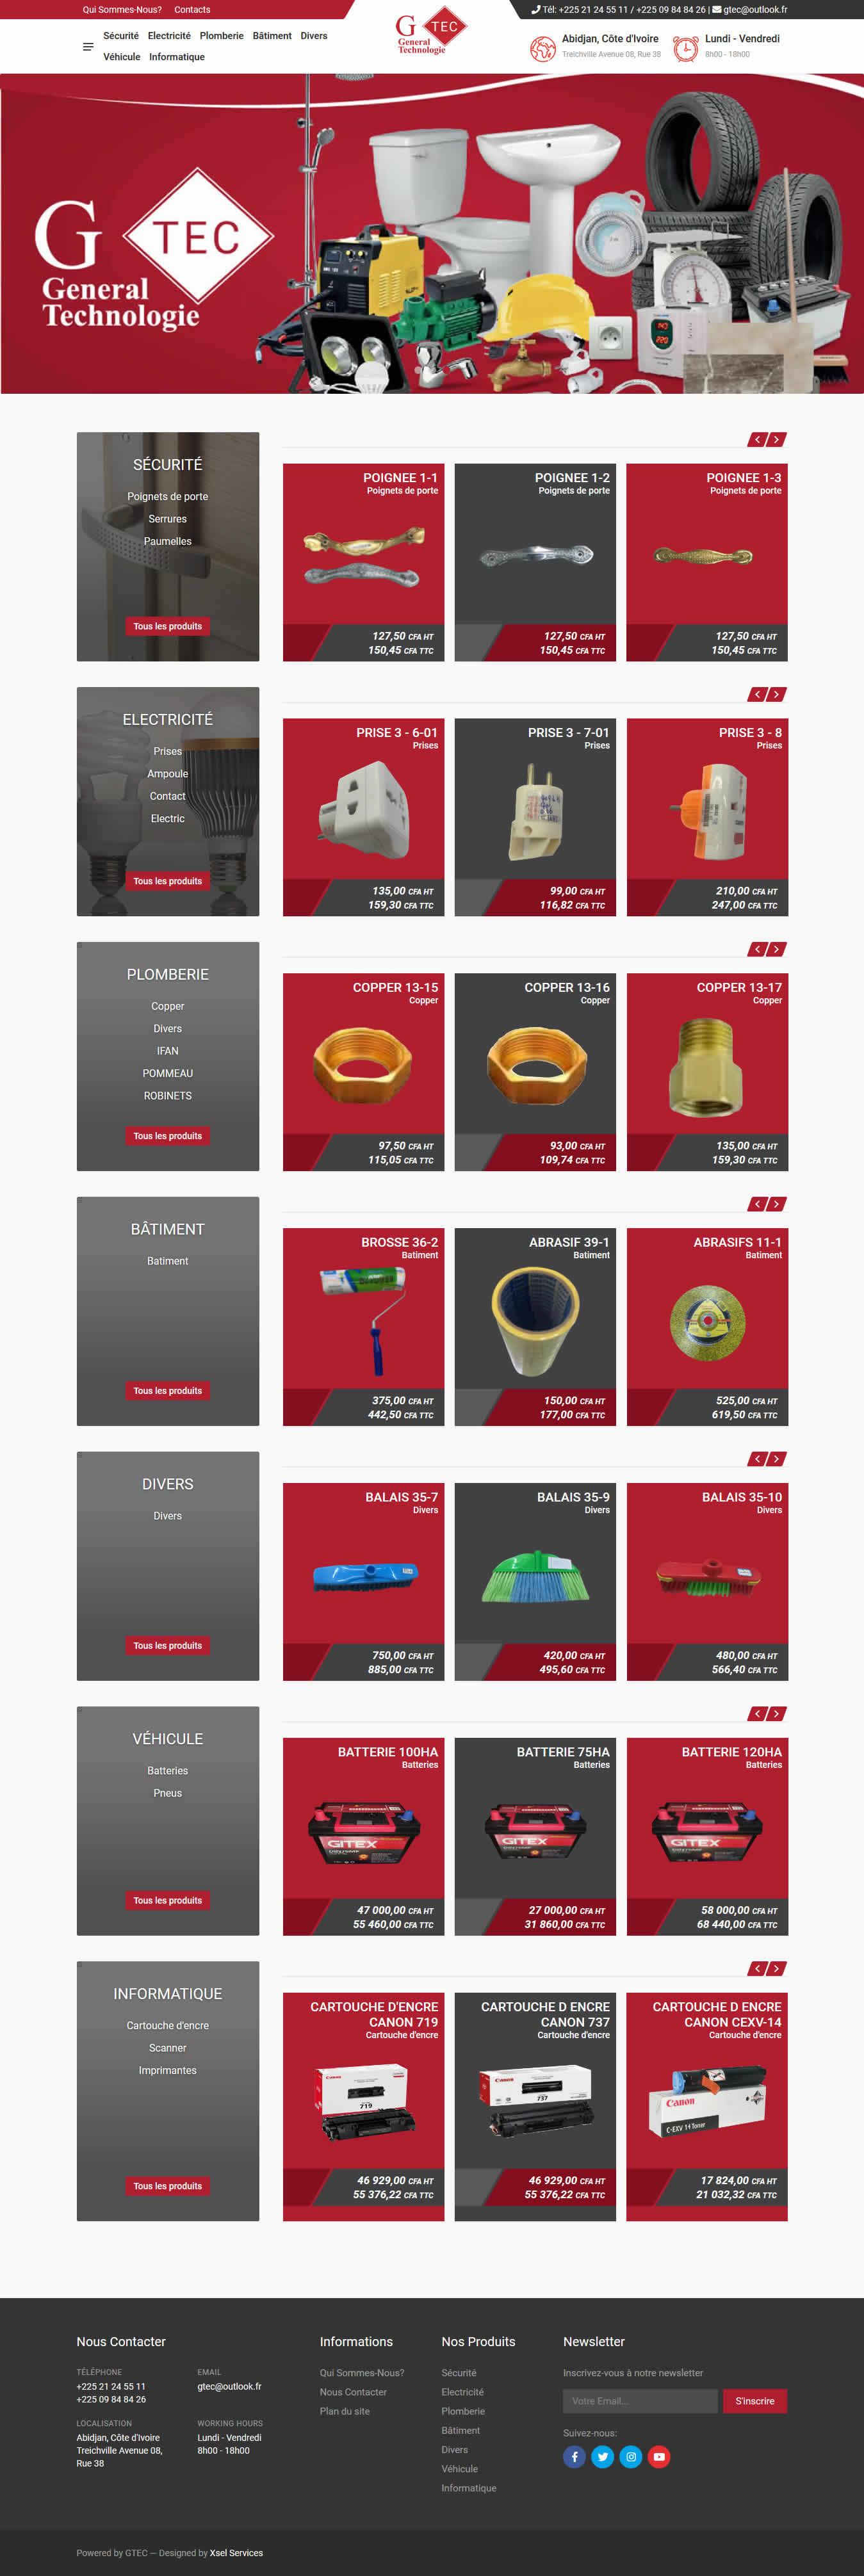 Web Design - GTEC